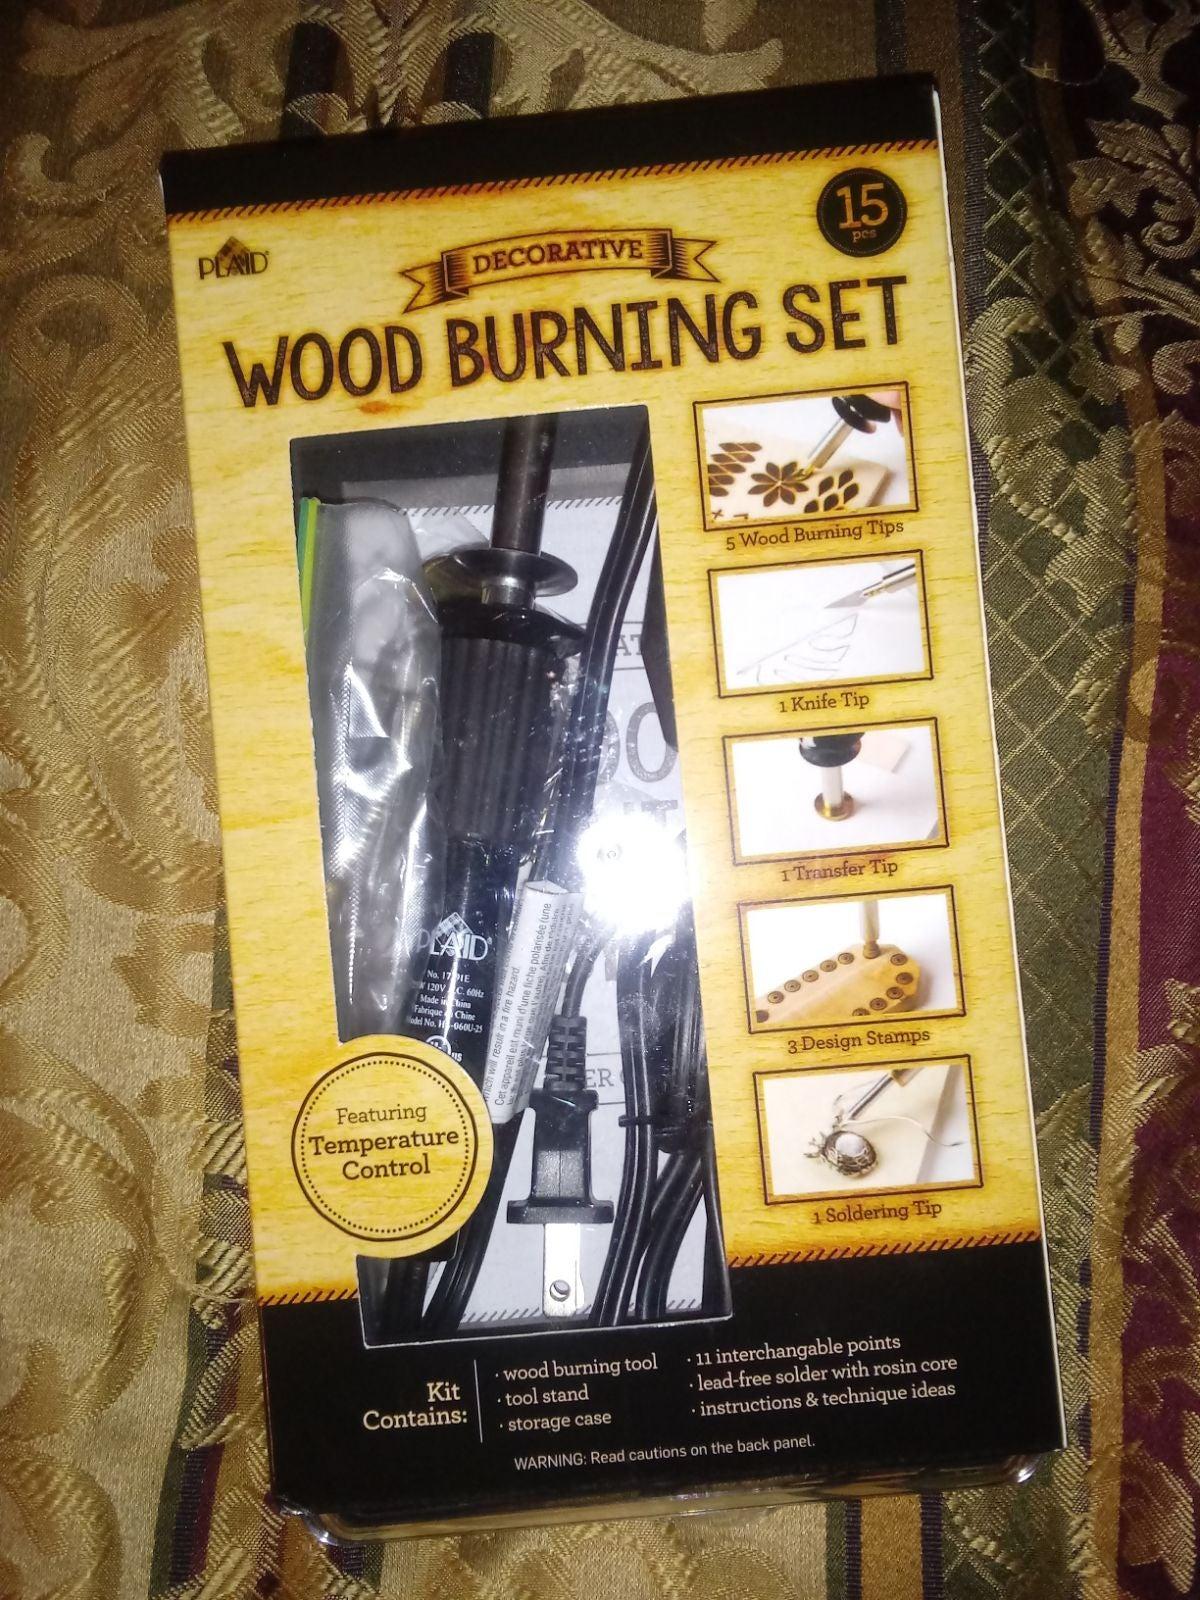 Crafting Wood burning kit by Plaid